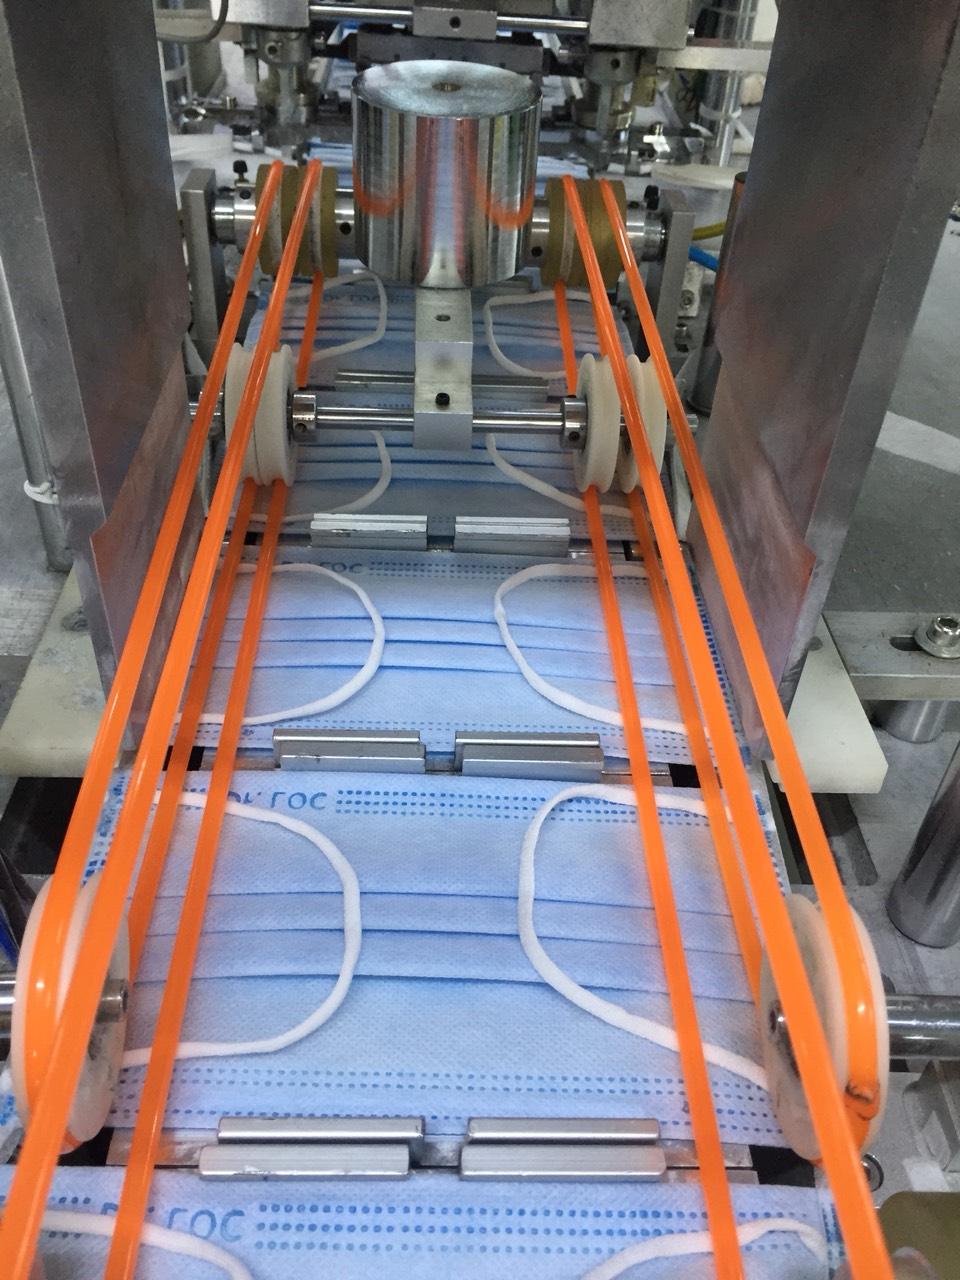 The conveyor is transferred through brazing